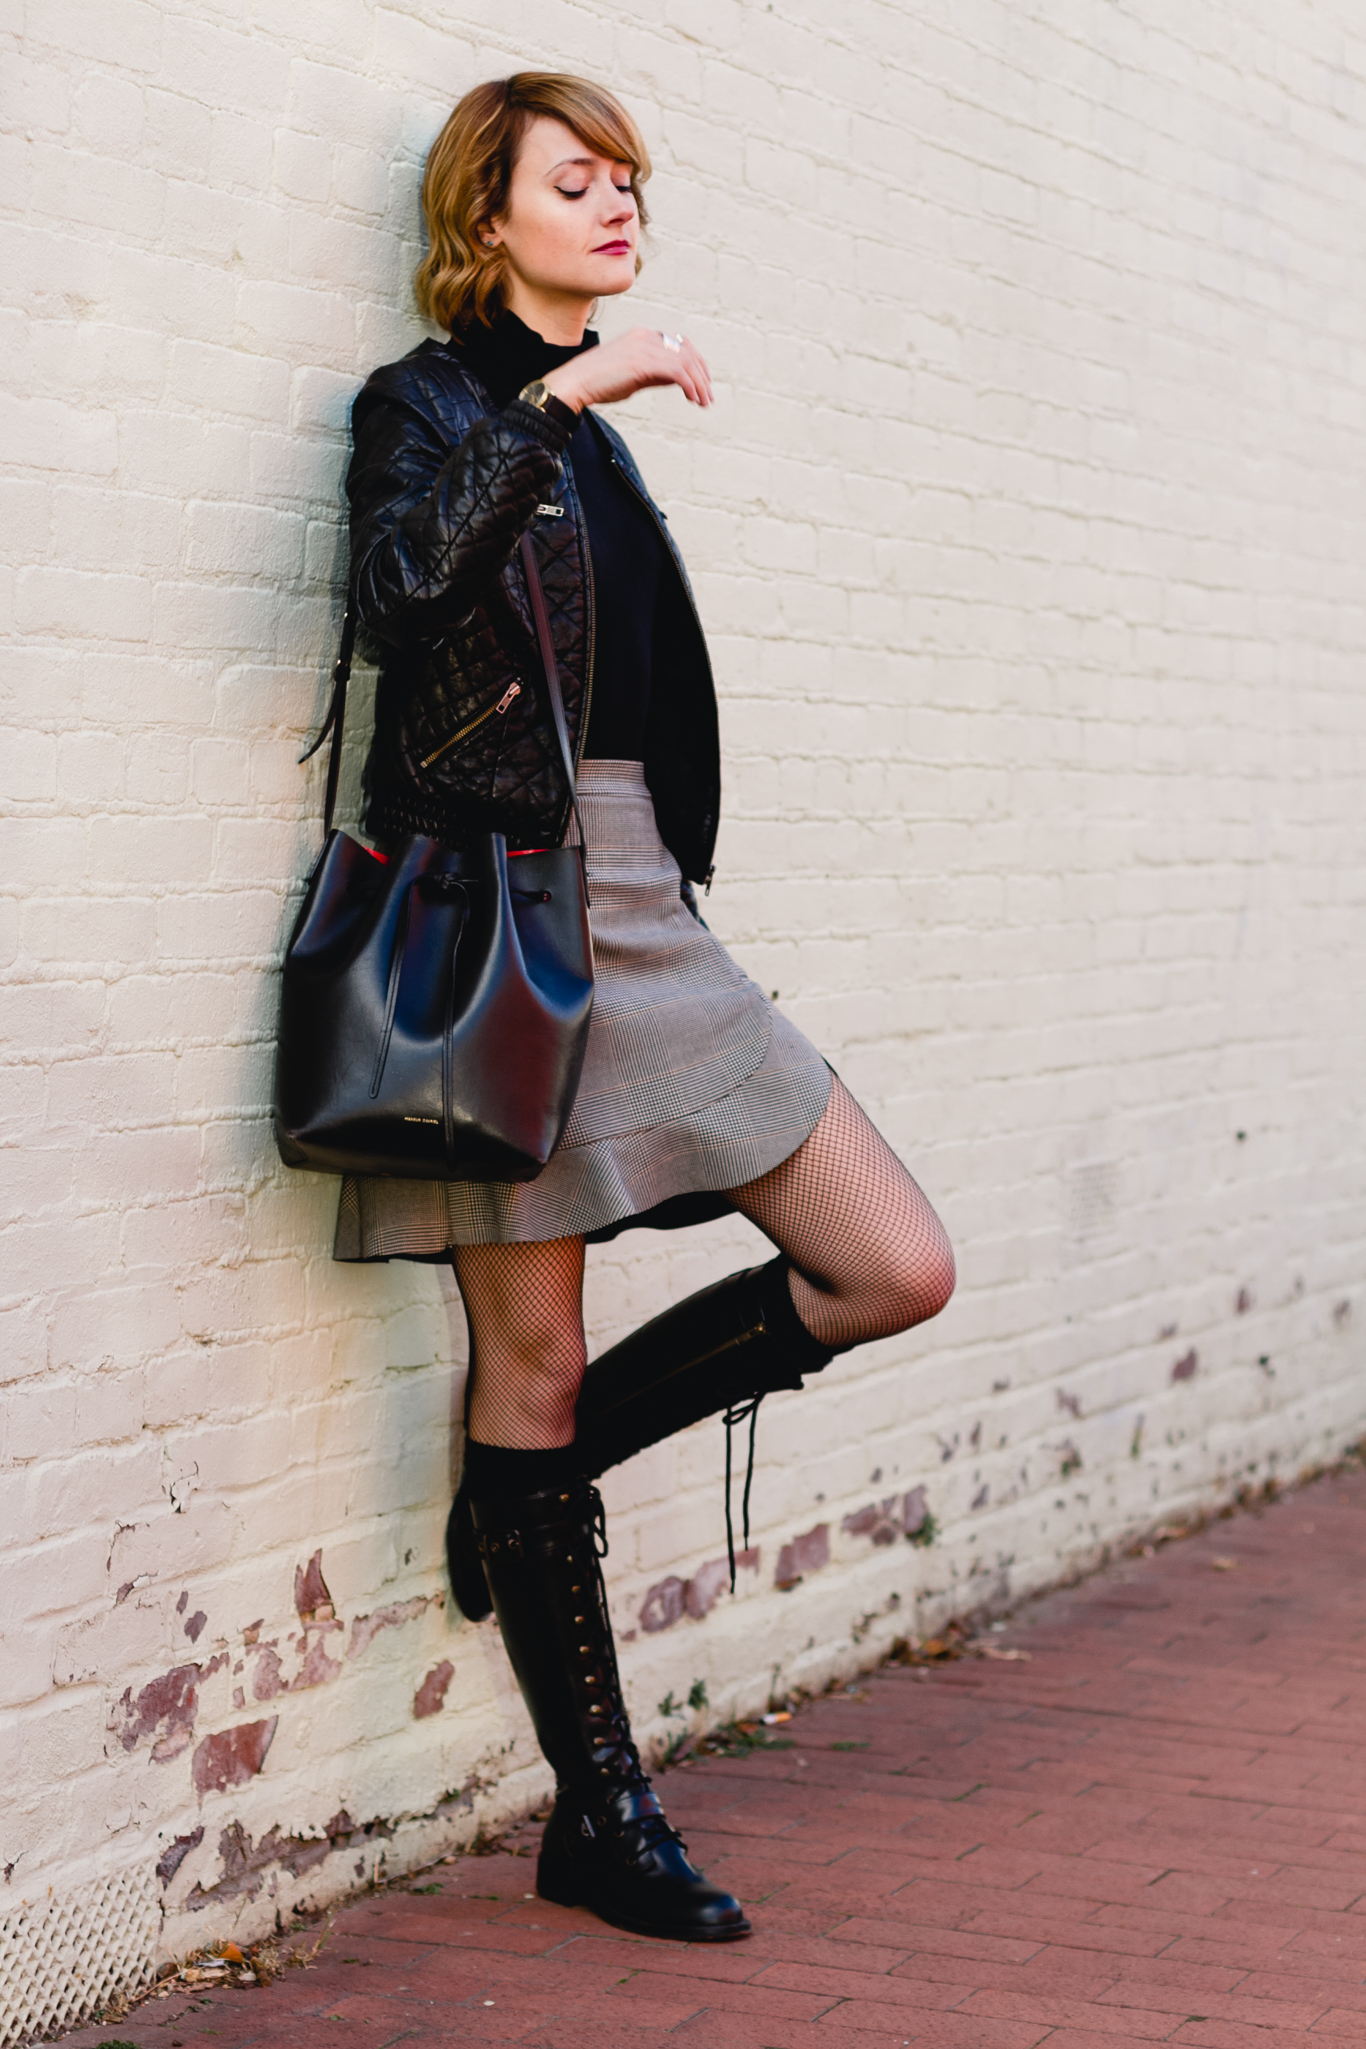 Zara plaid skirt and DKNY combat boots